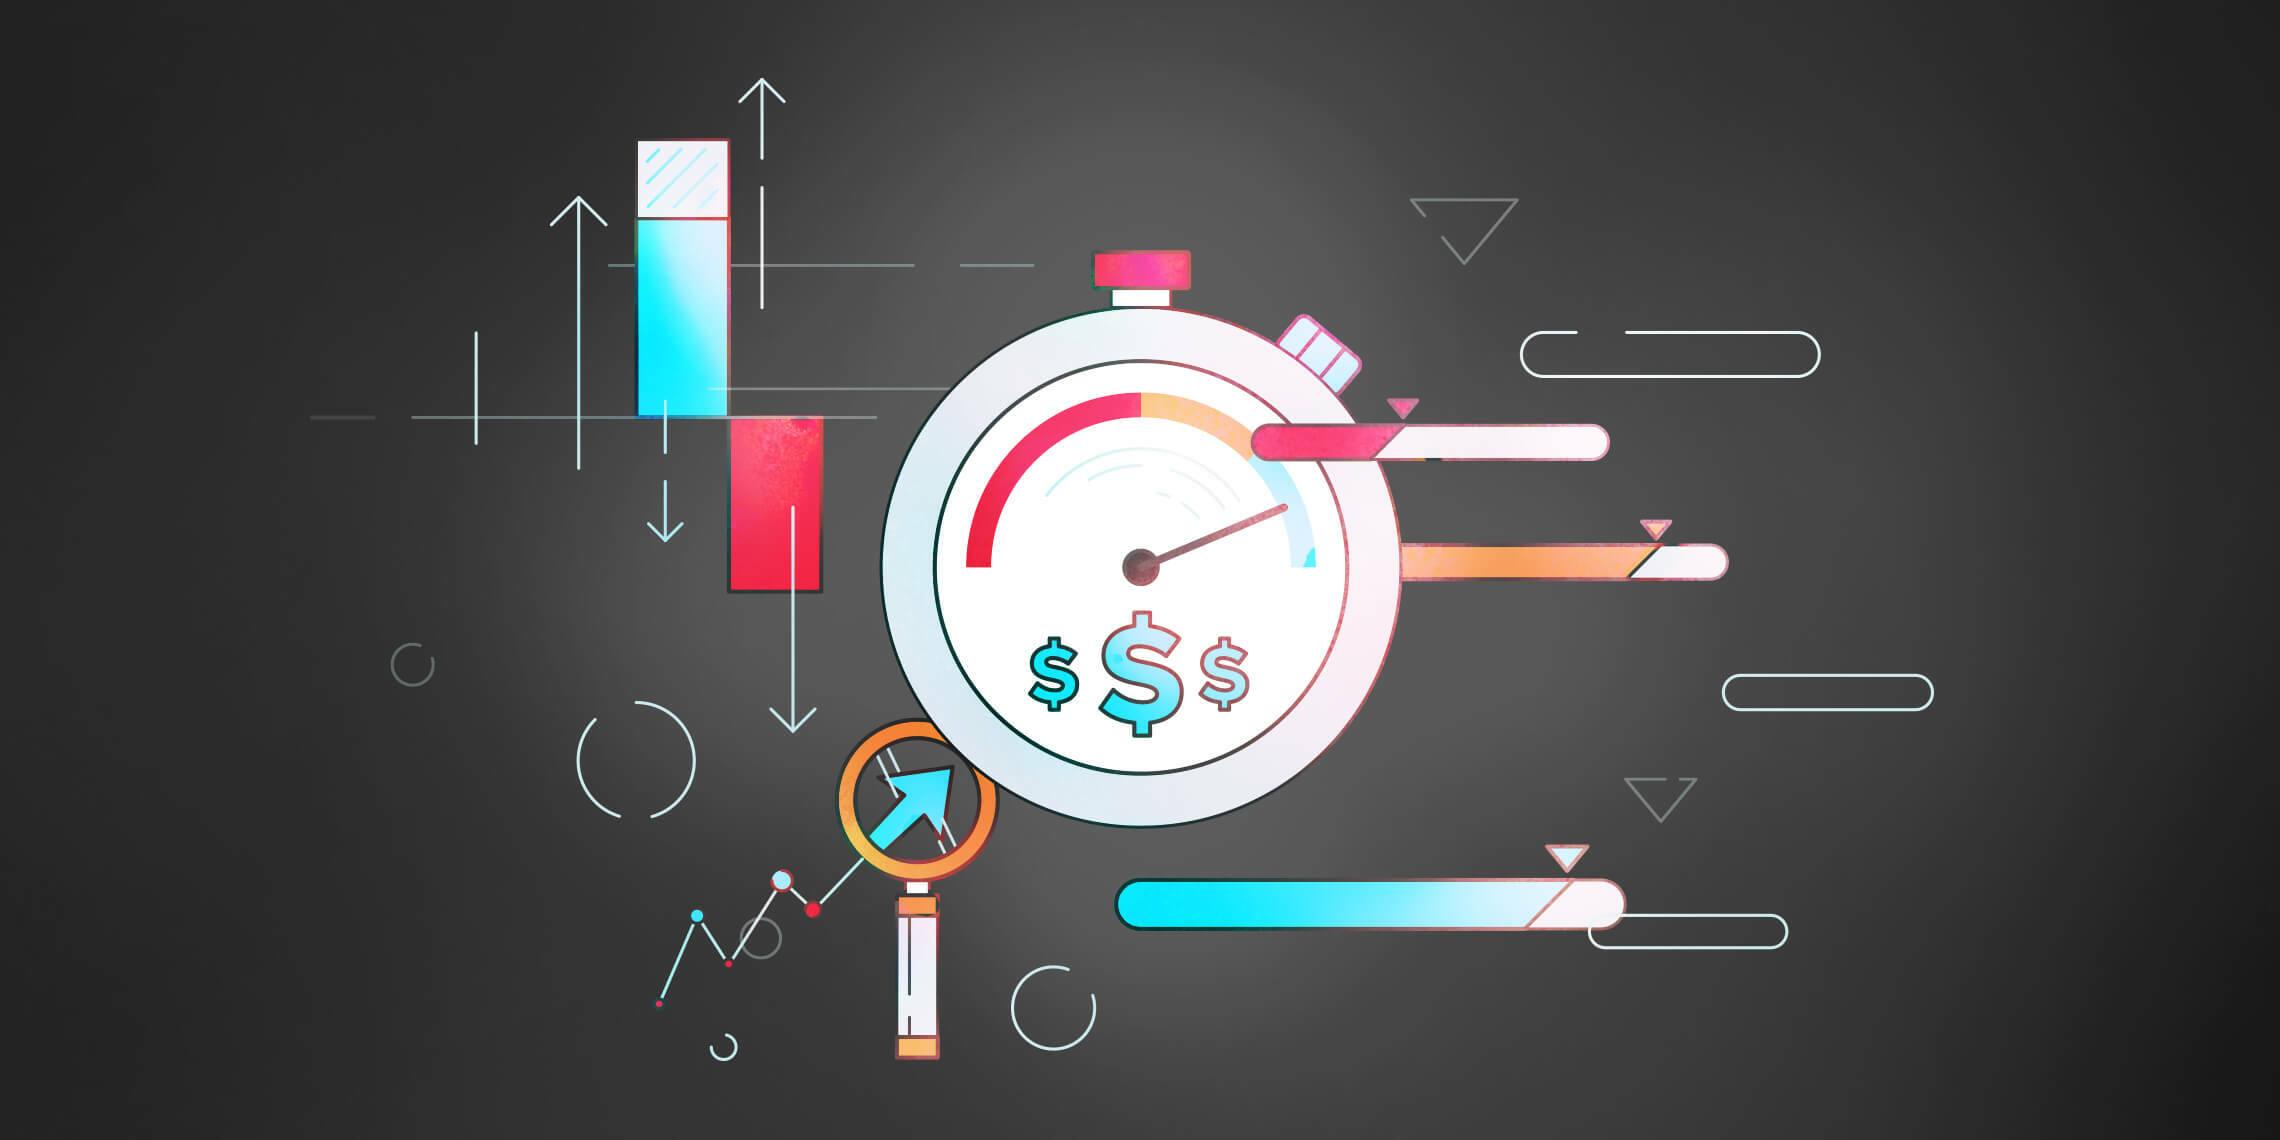 agency profitability metrics and kpis